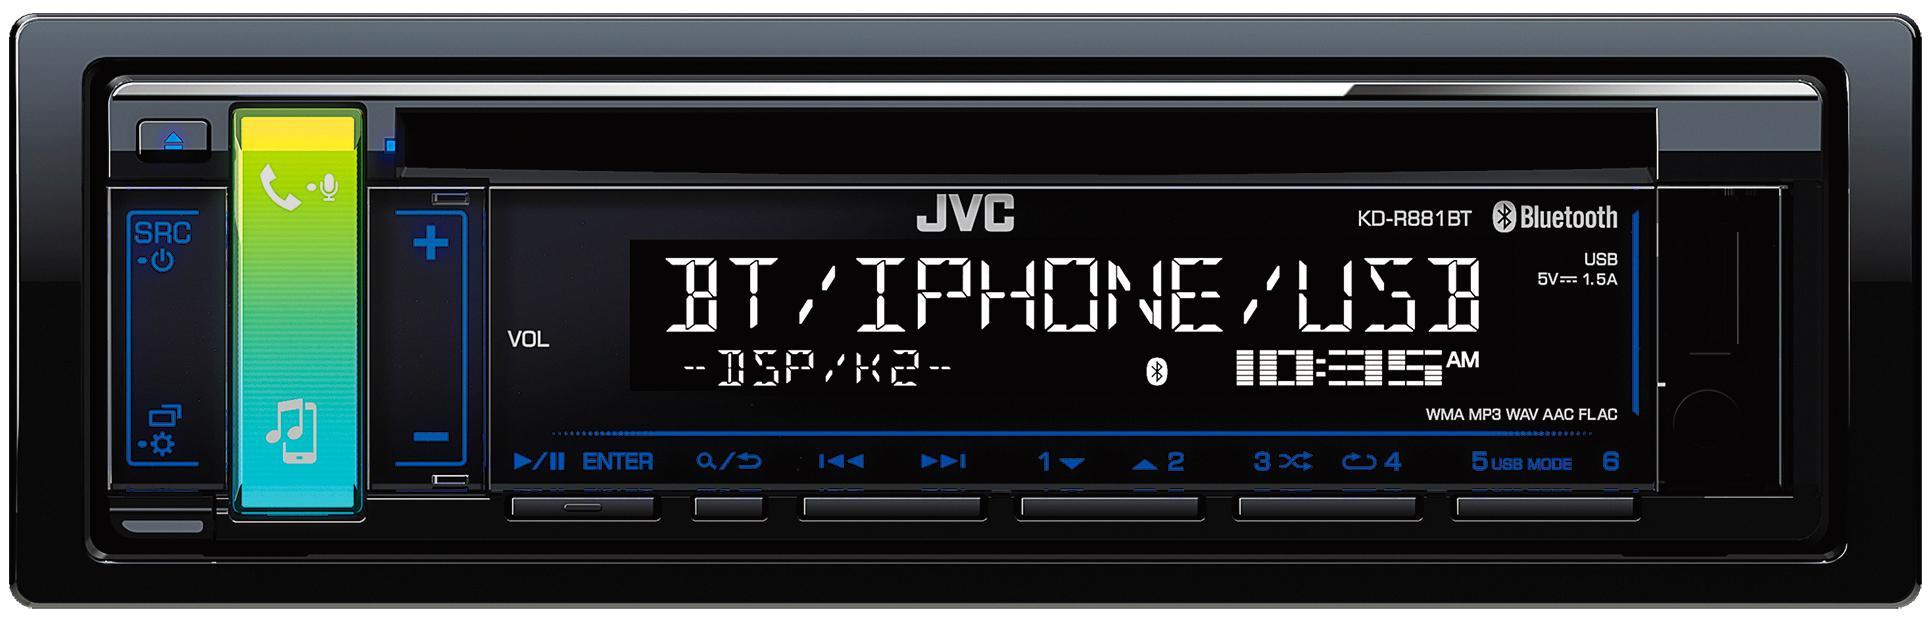 jvc kd r881bt usb receiver bluetooth music sound device. Black Bedroom Furniture Sets. Home Design Ideas